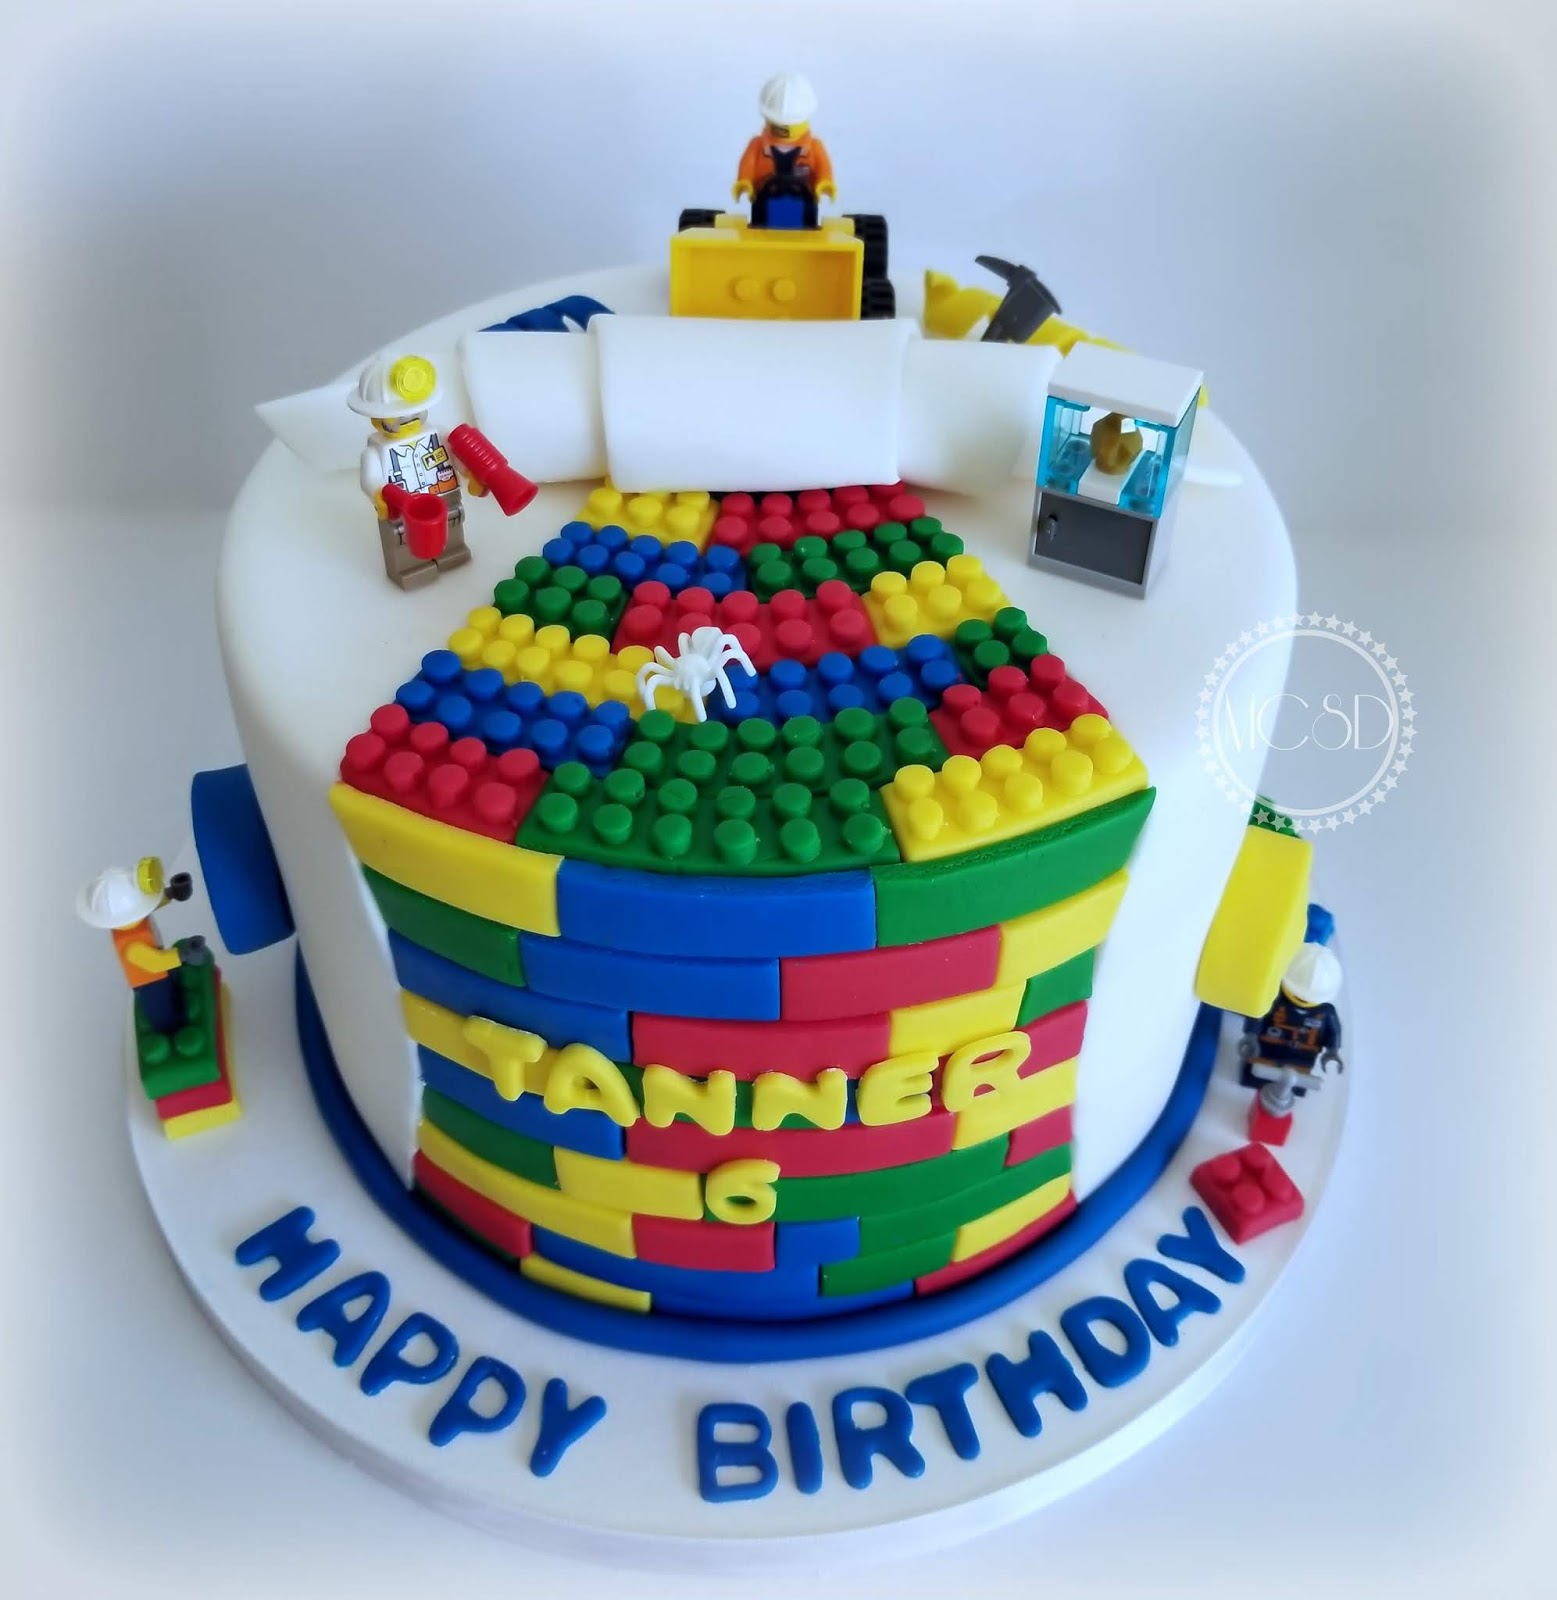 Pleasant Cakesbyzana Lego Birthday Cake Personalised Birthday Cards Veneteletsinfo